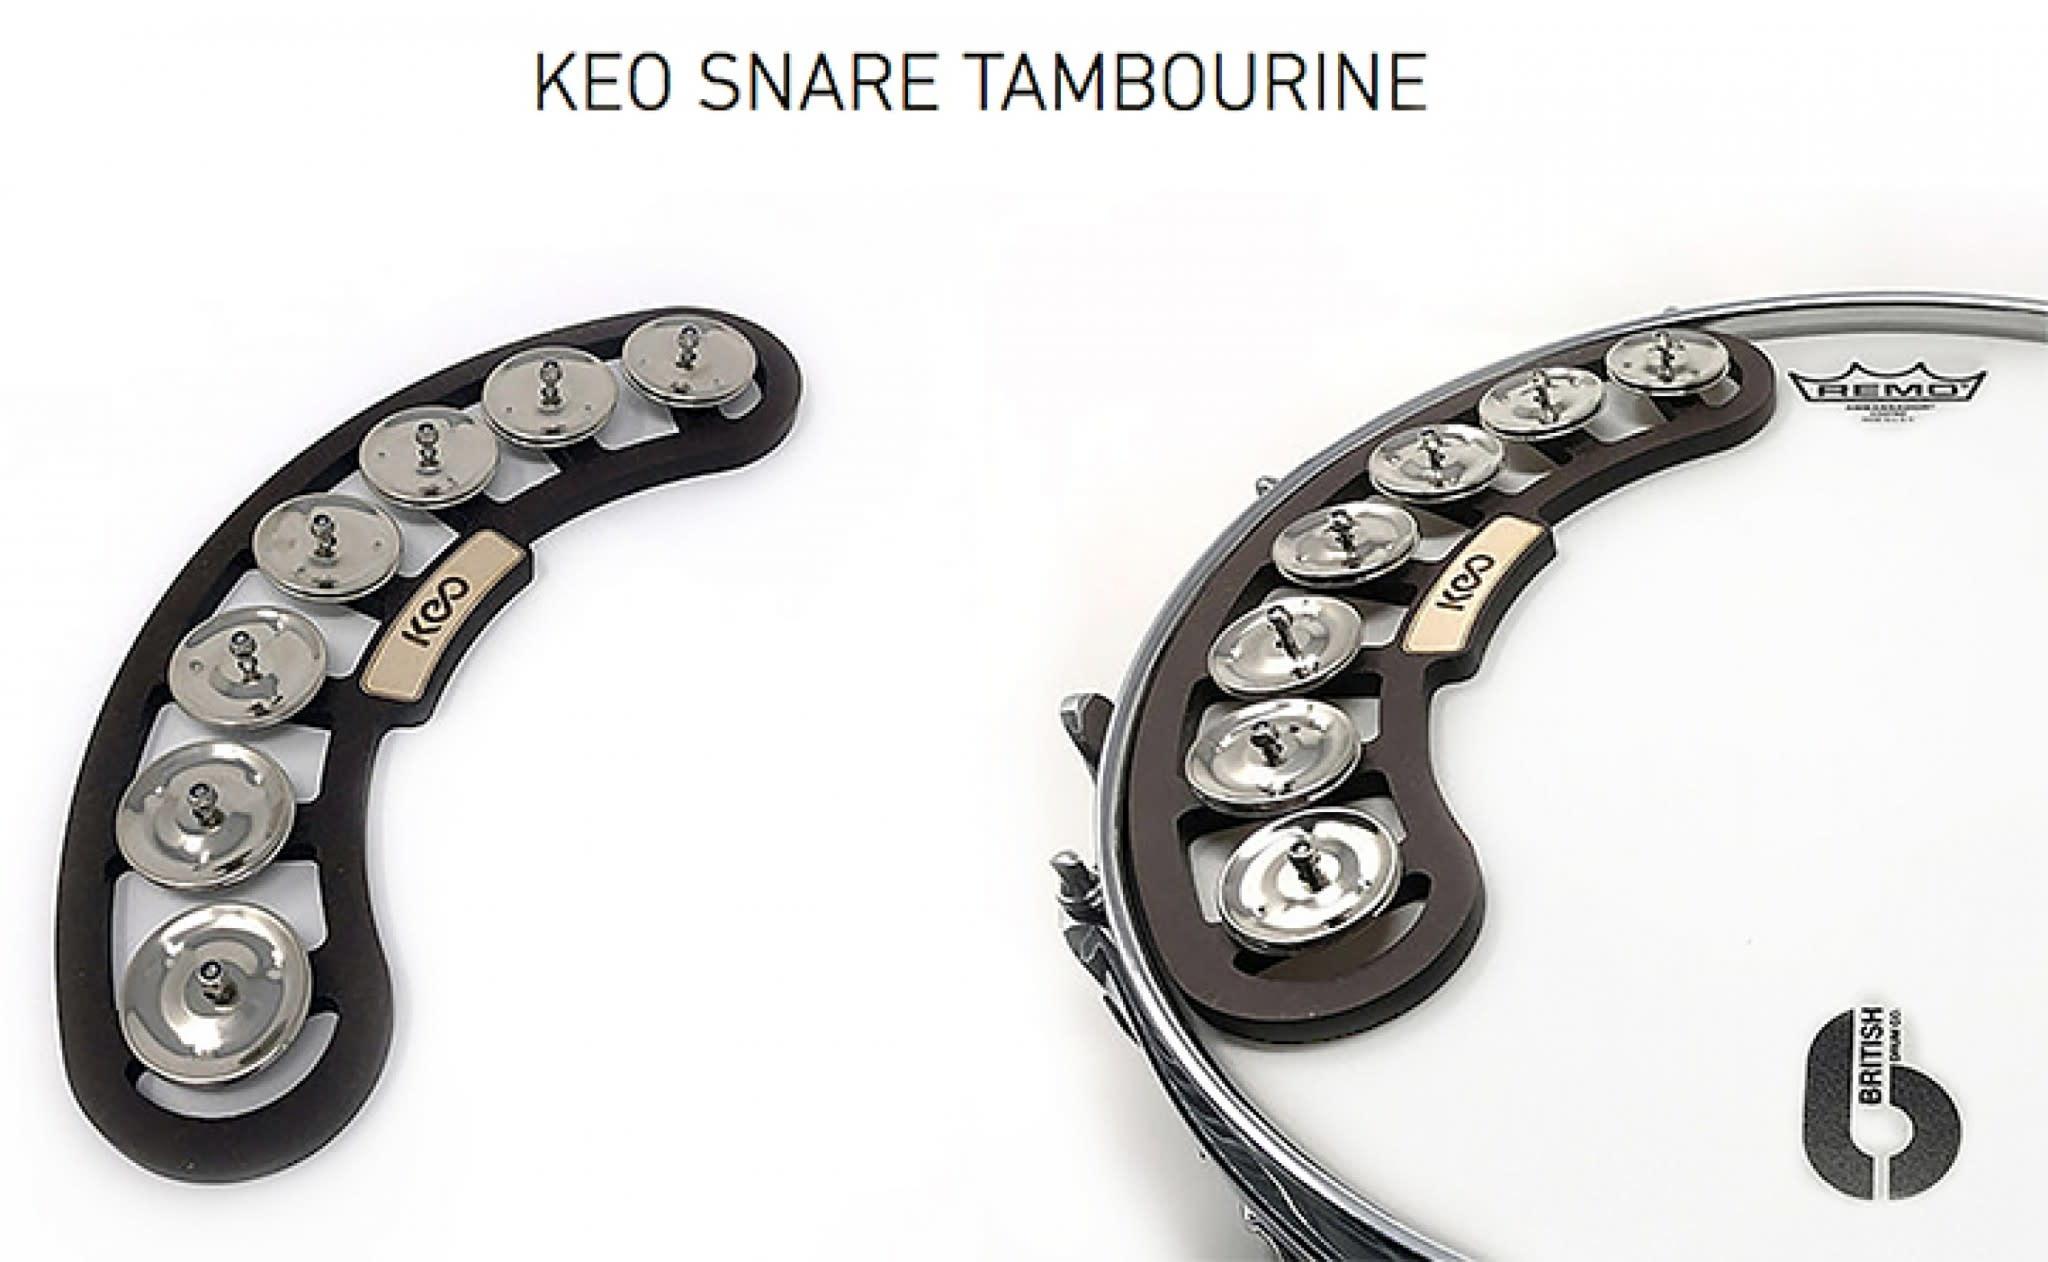 Keo Keo Percussion Snare Tambourine